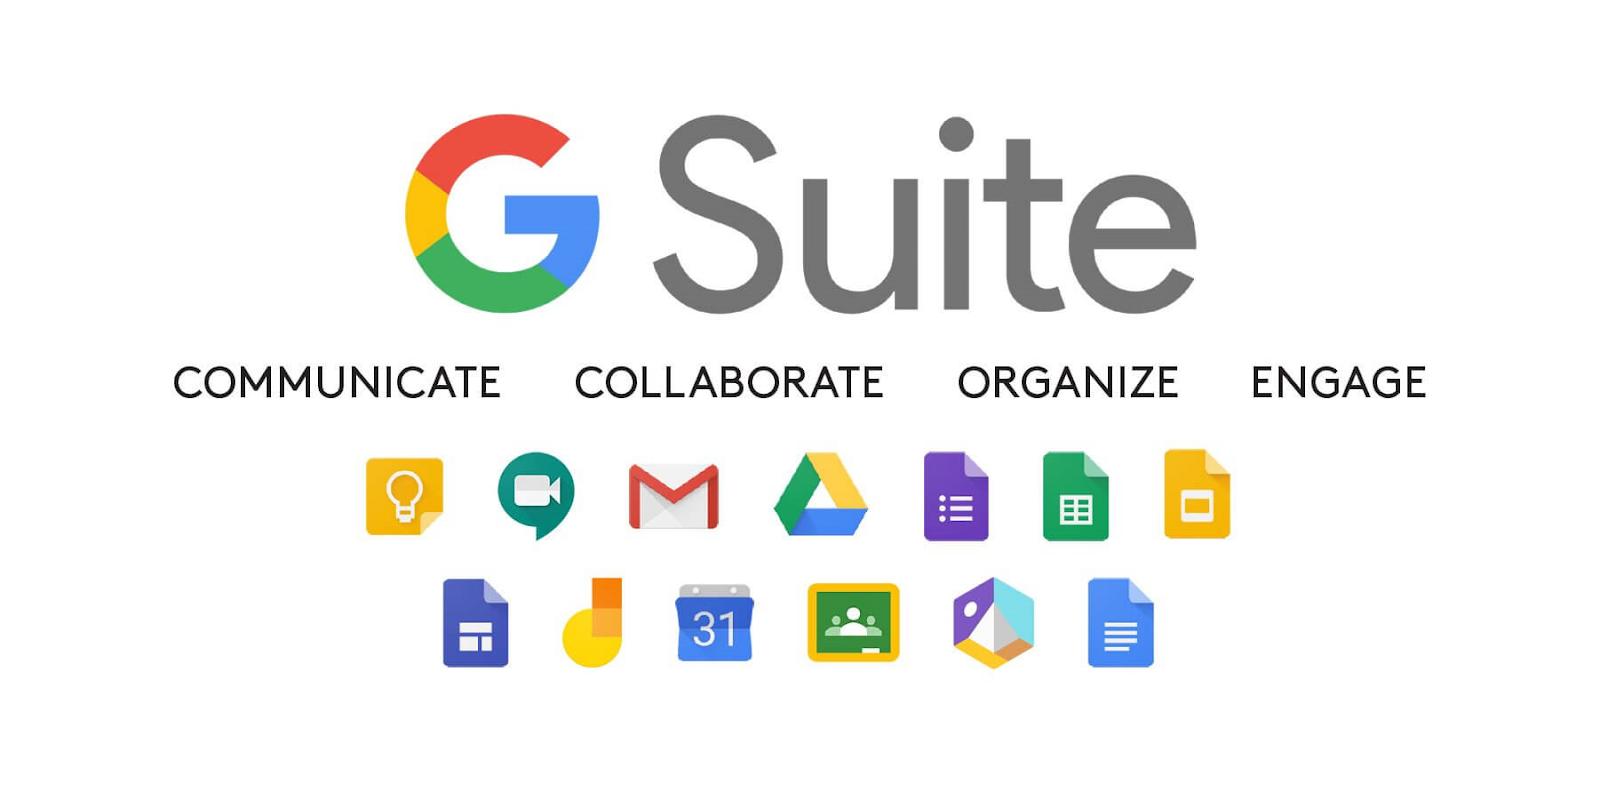 G Suite 2015 redesign case study